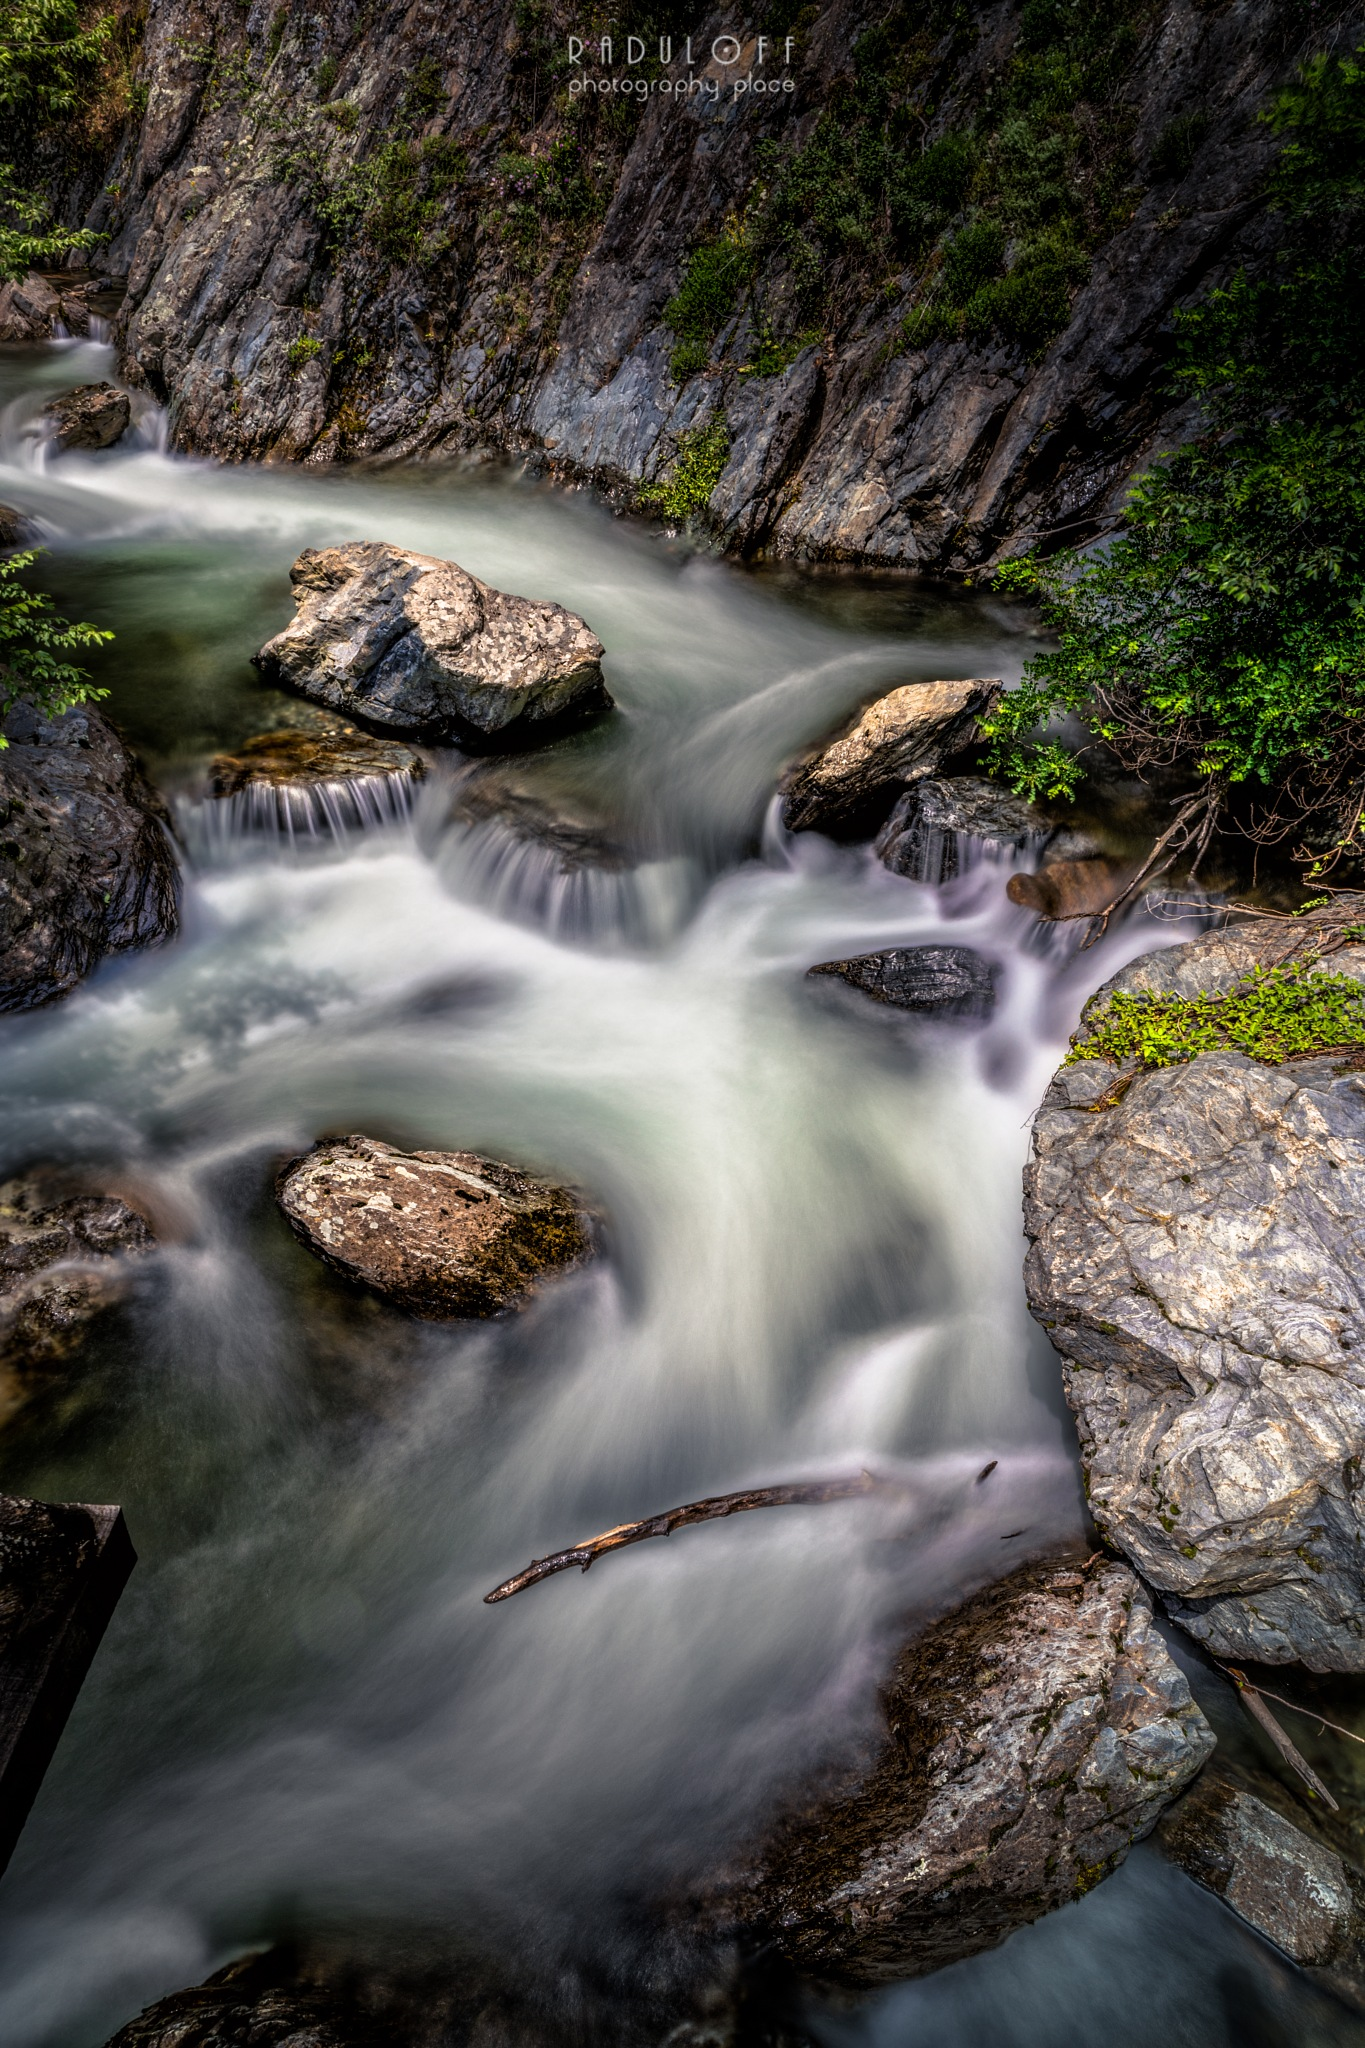 Water in motion IV by Nikolay Radulov